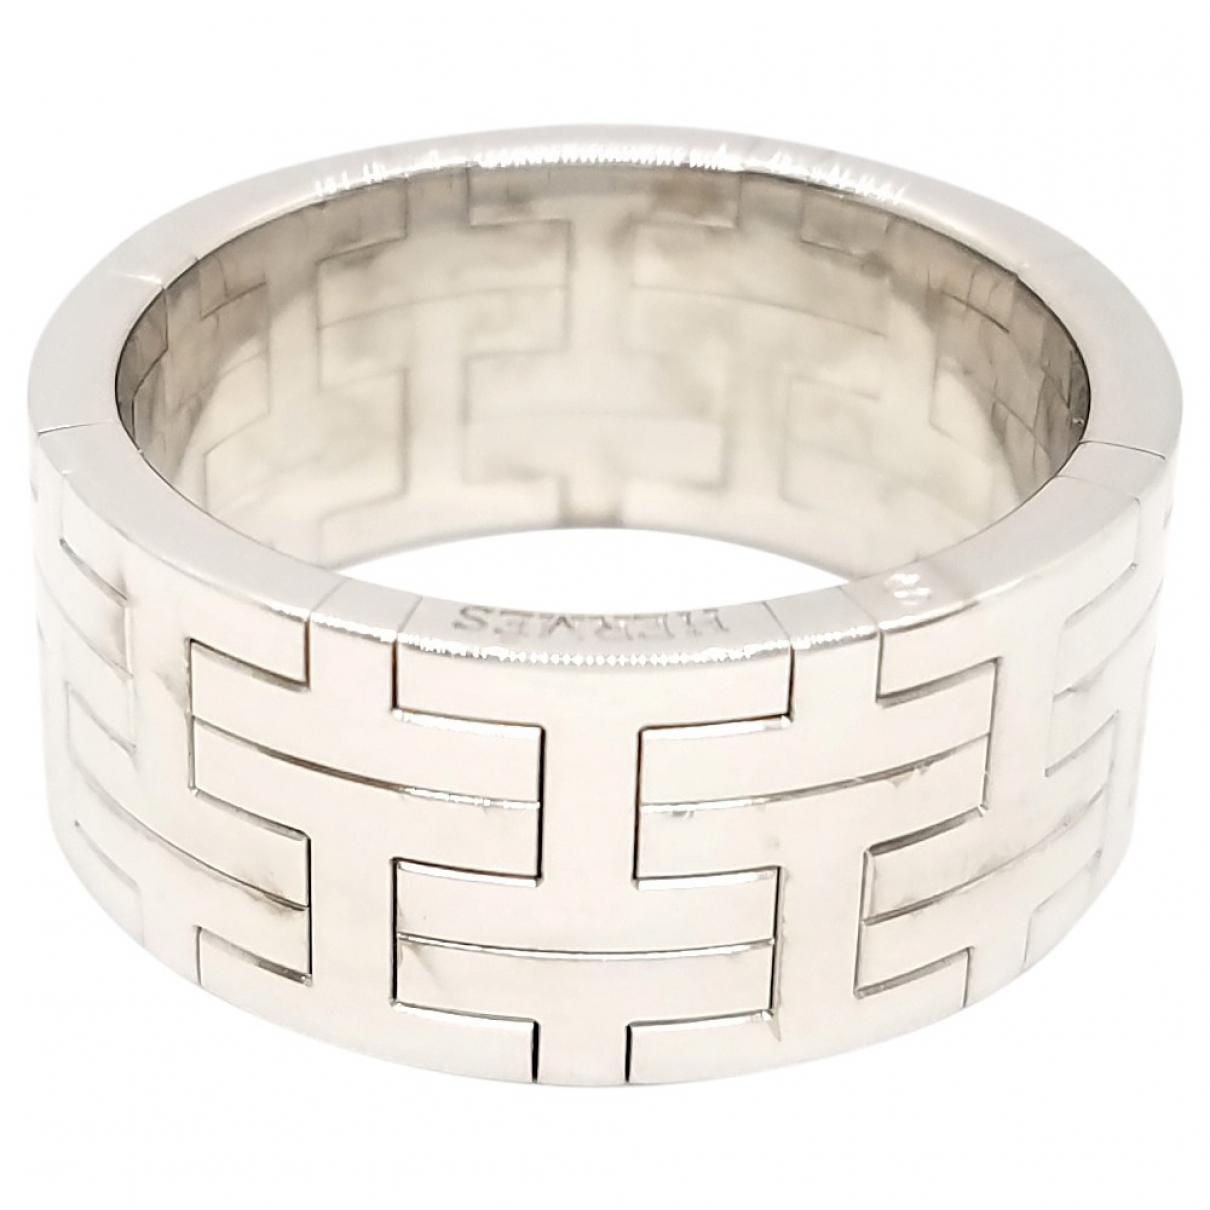 Hermes \N Ring in  Silber Weissgold